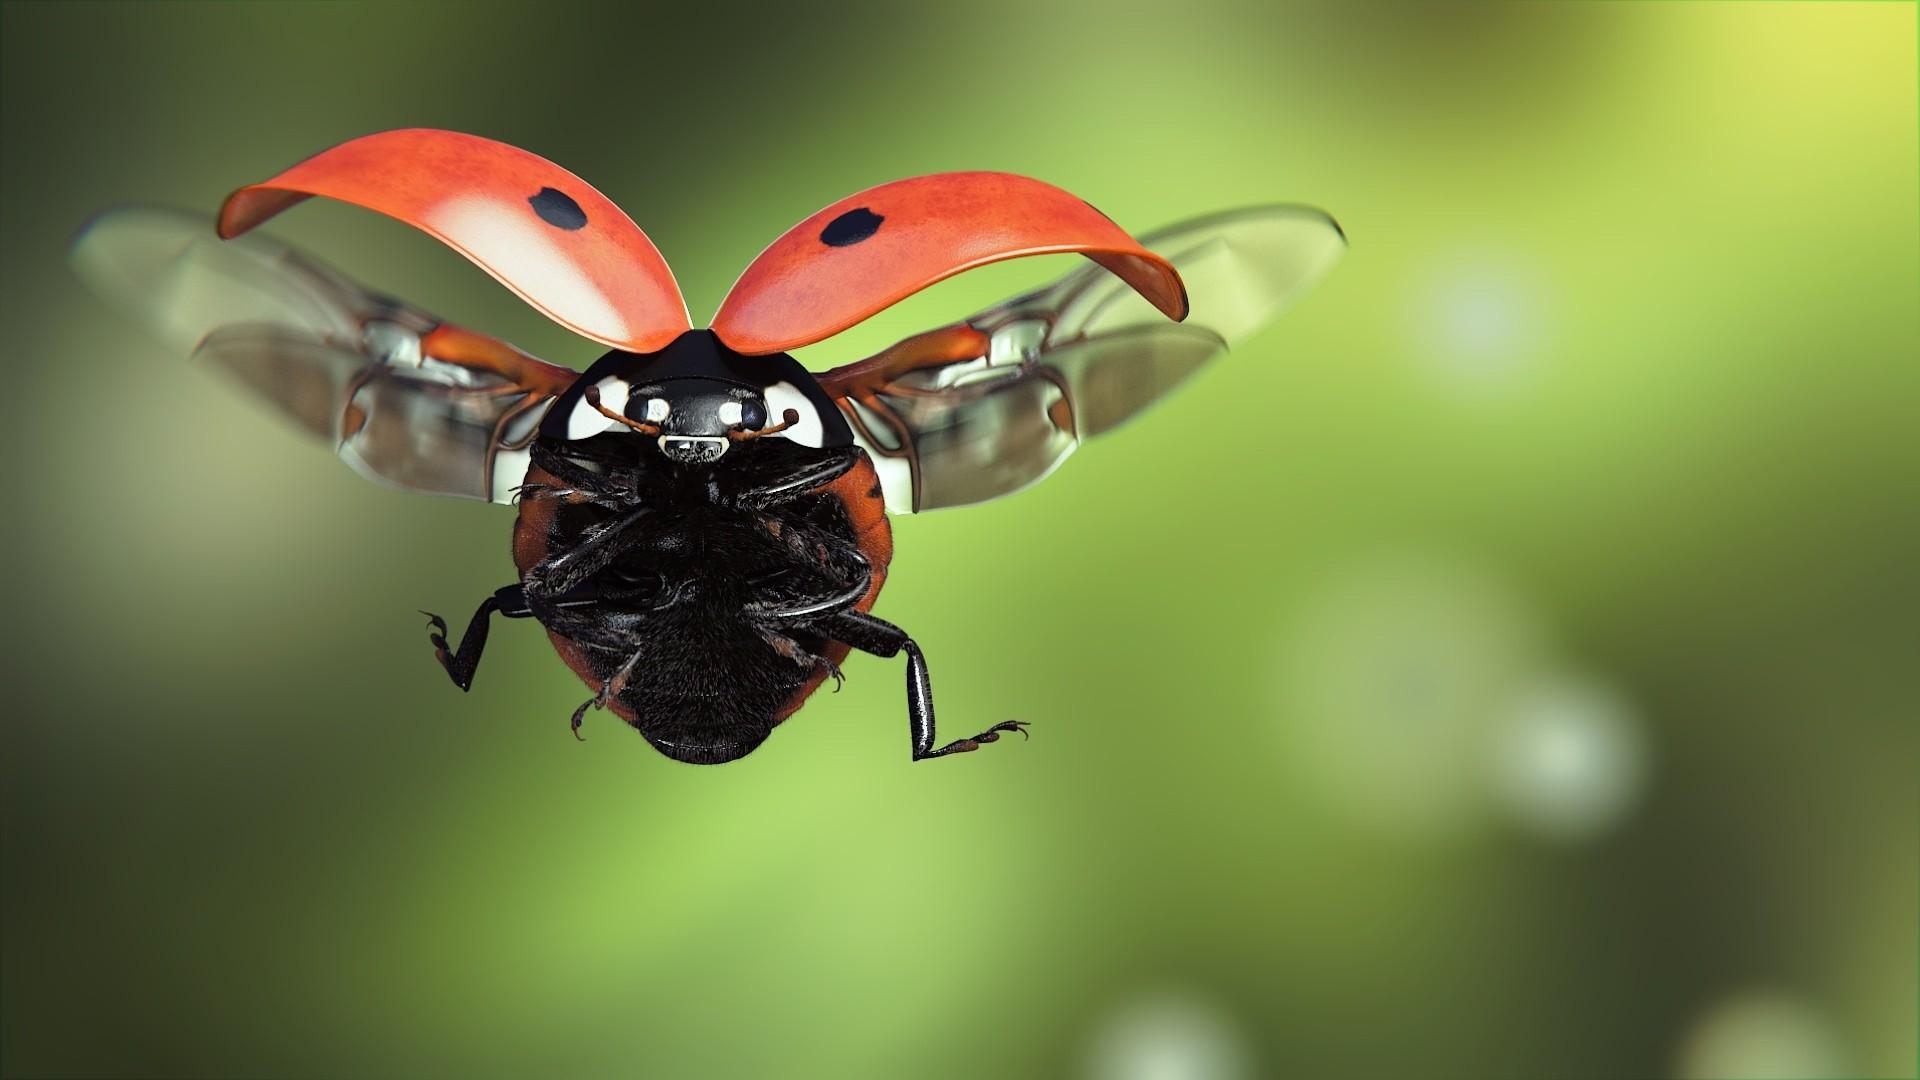 Fly Desktop Wallpaper